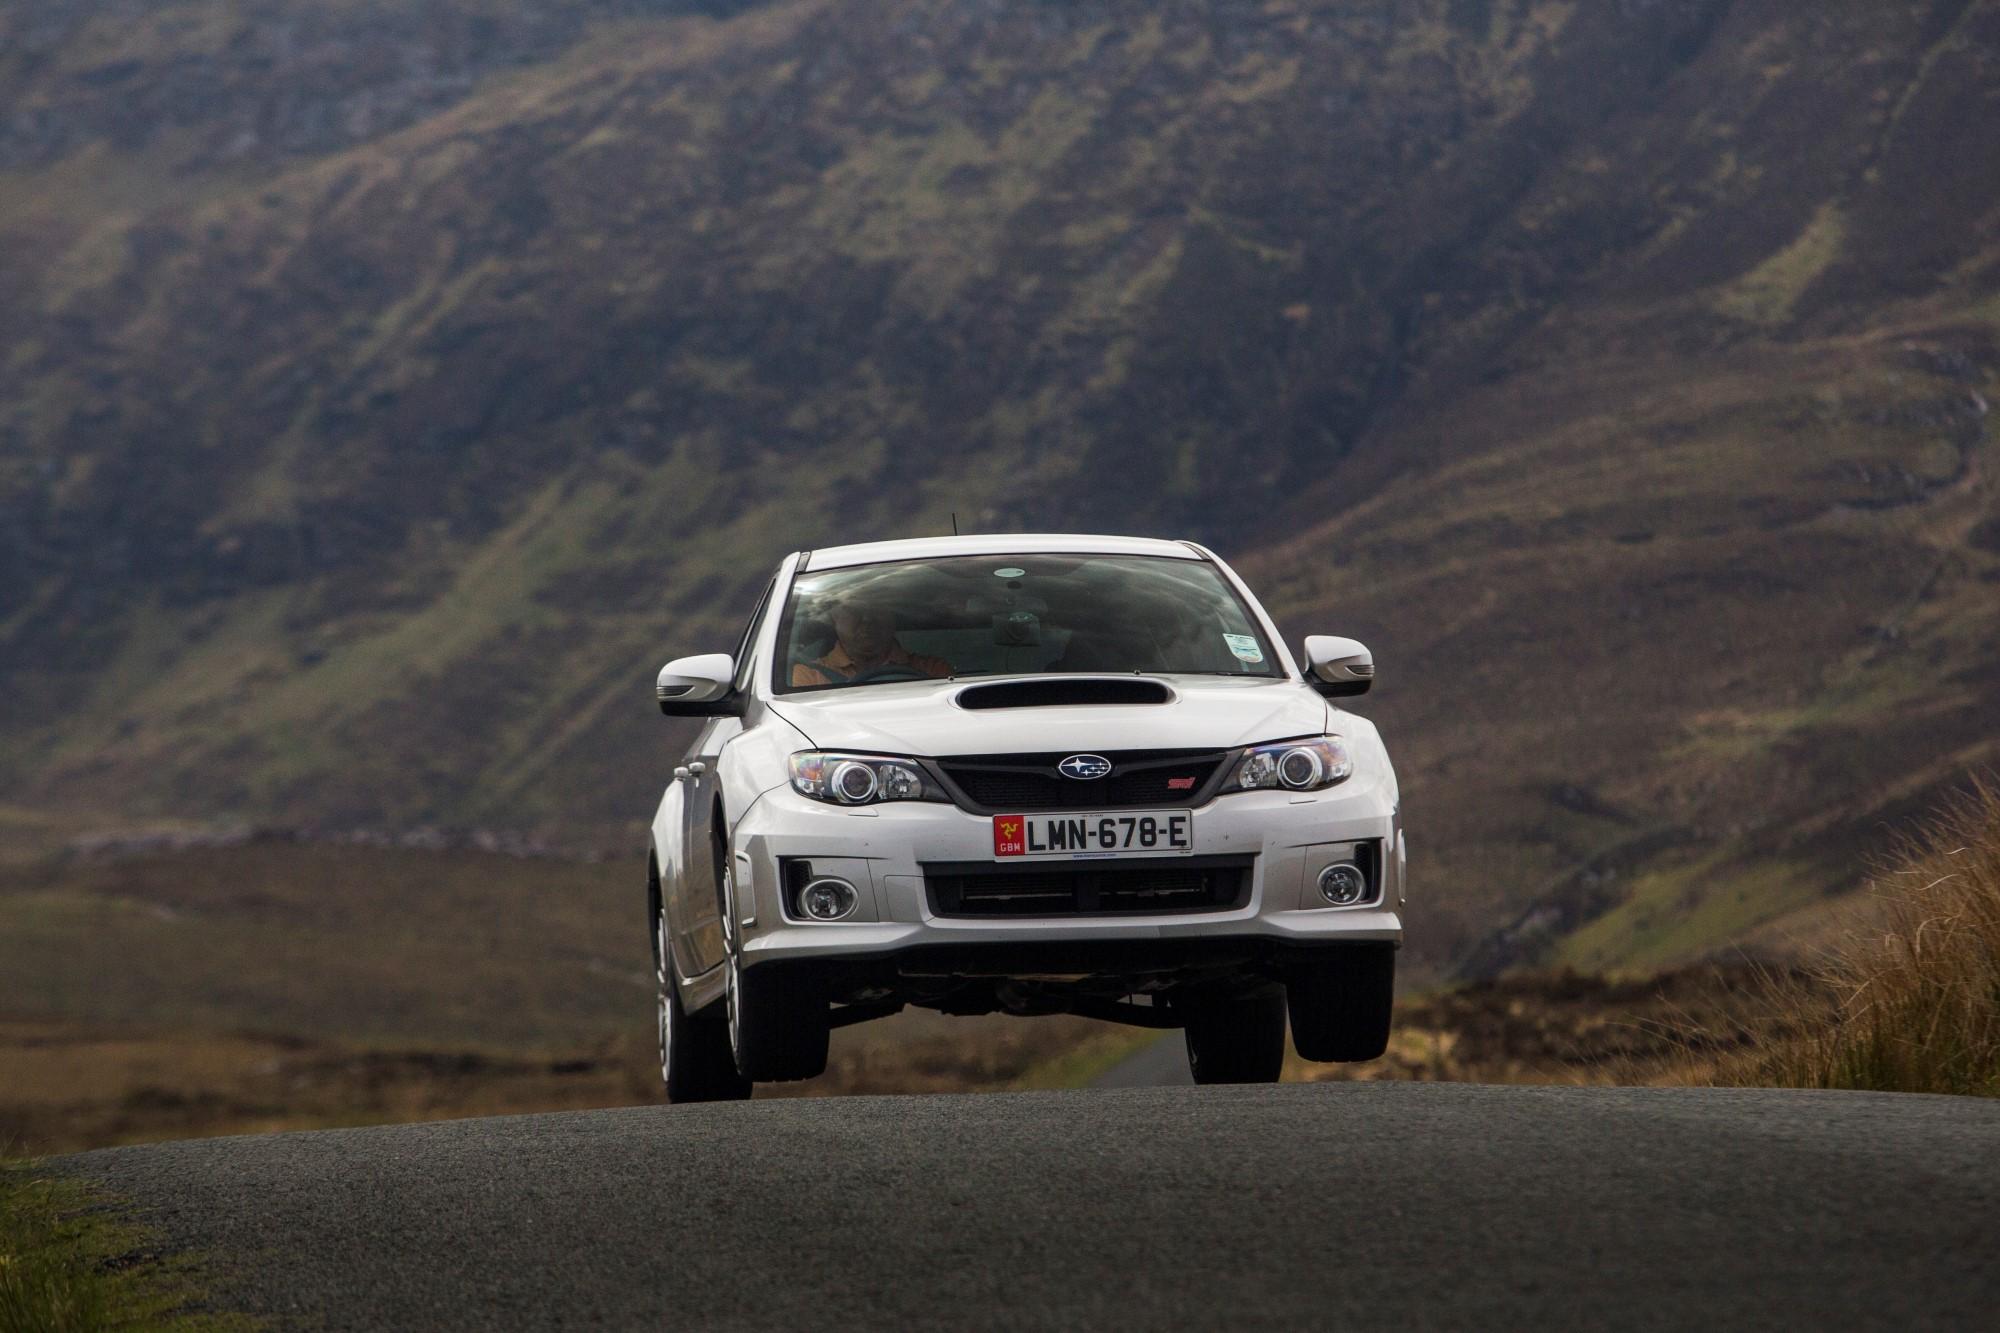 2014 mercedes s class production 100k bmw i3s reserved goodbye sti car news headlines